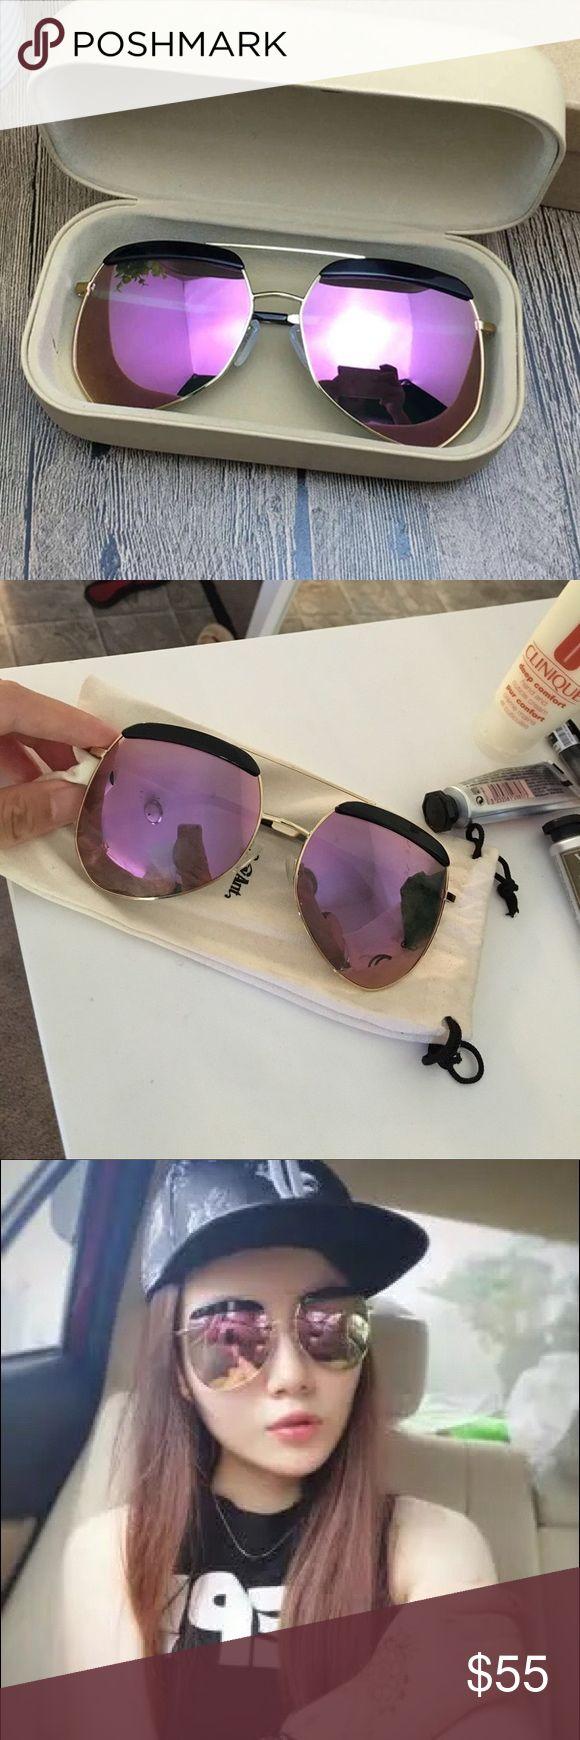 grey ant sunglasses Super cool. Dust bag included.  No box. 80% new Accessories Sunglasses